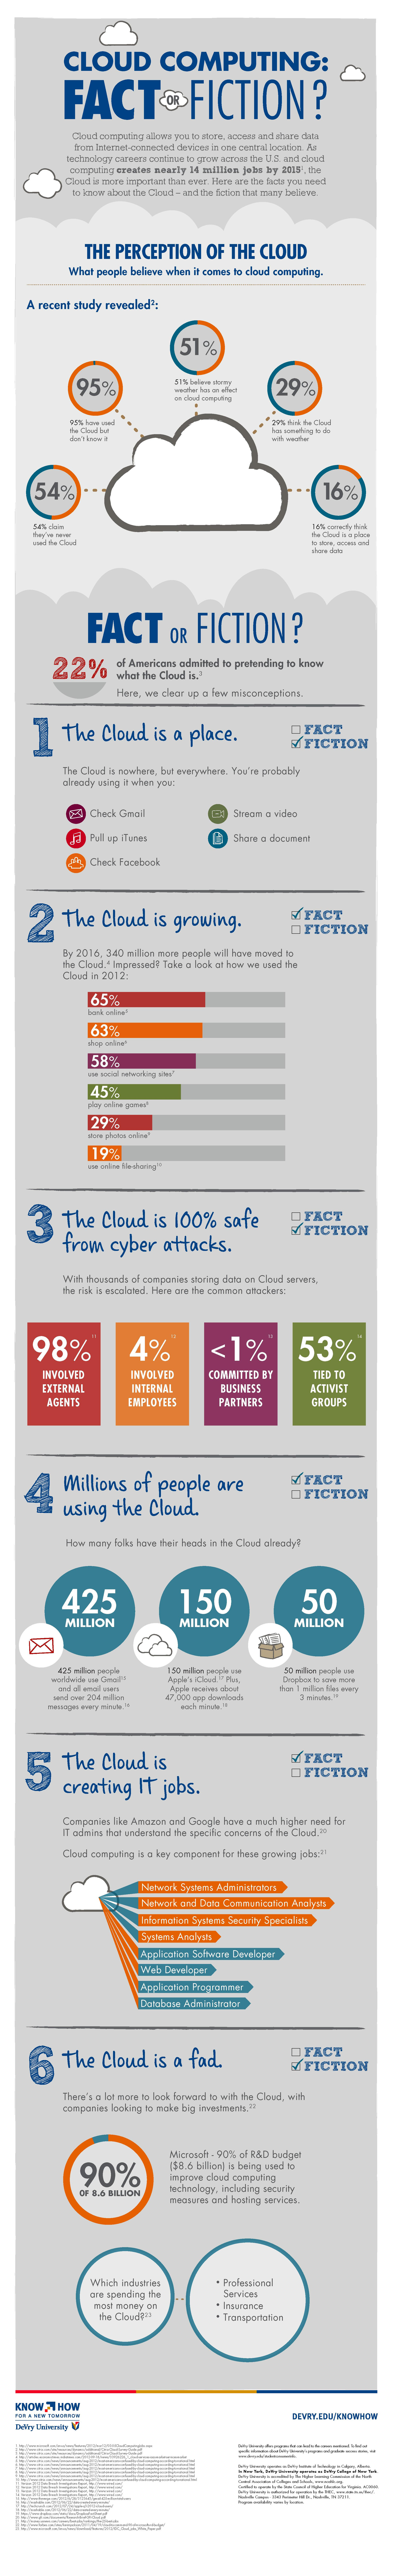 cloud-computing--fact-or-fiction_50e70989a7e6c